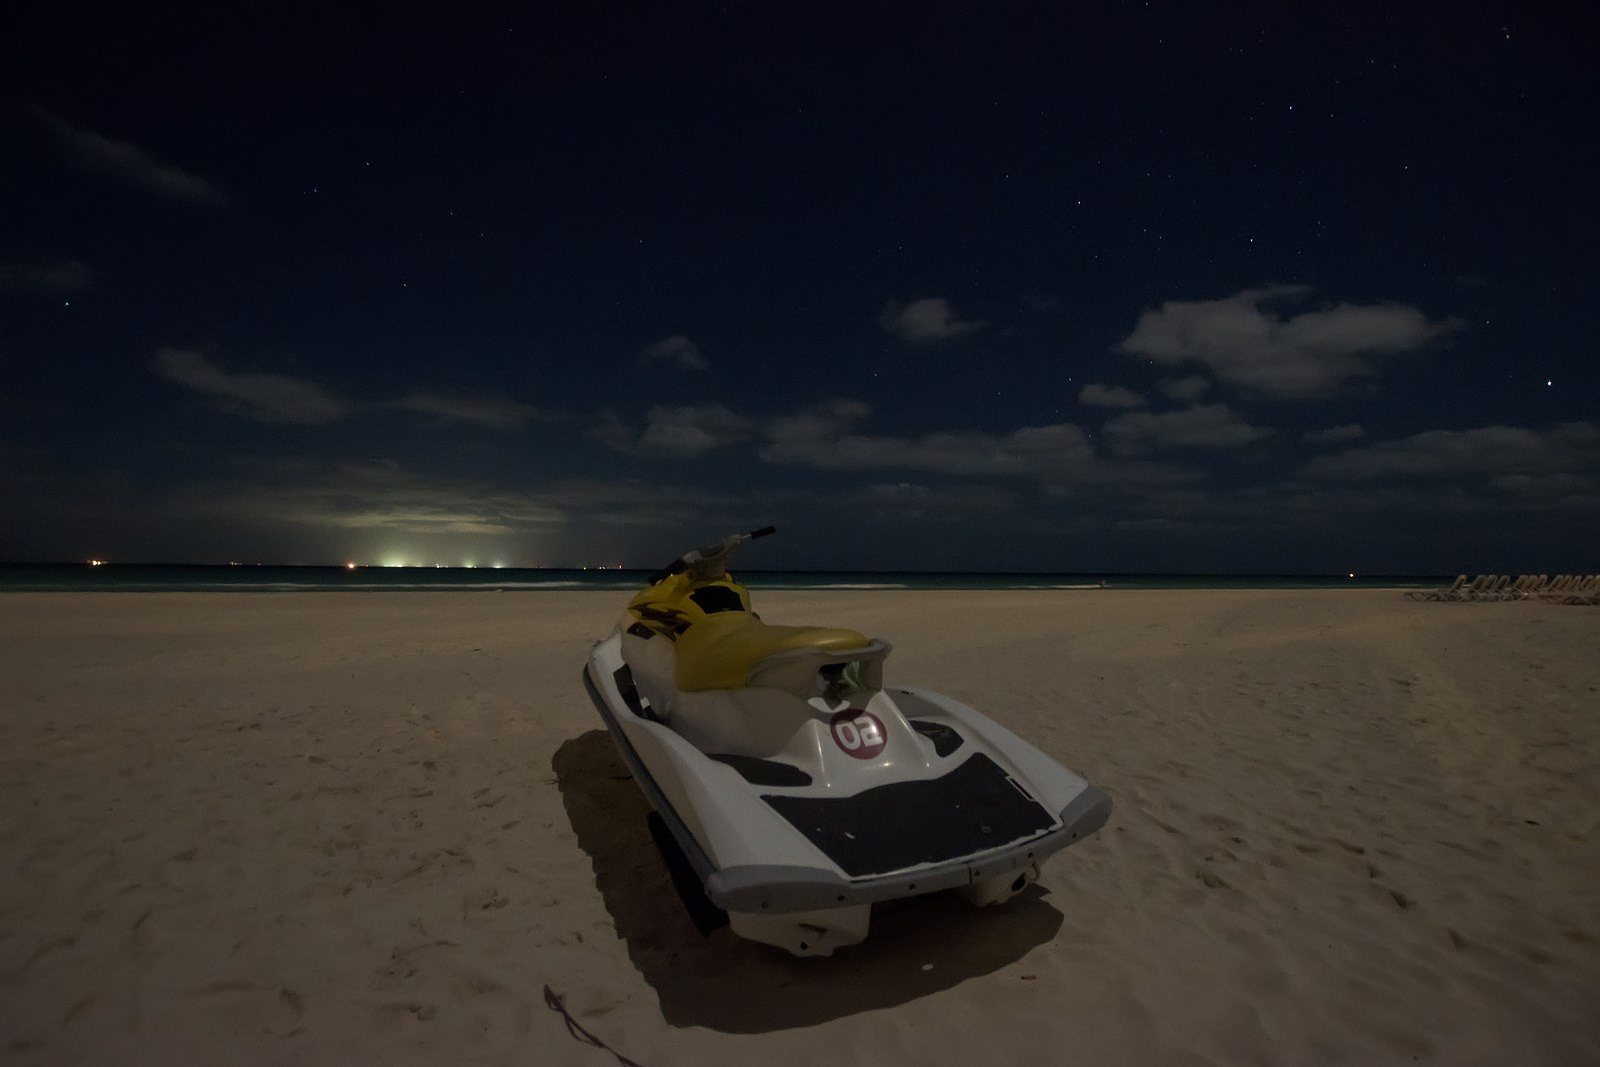 Night on the beach by Waldemar Sadlowski